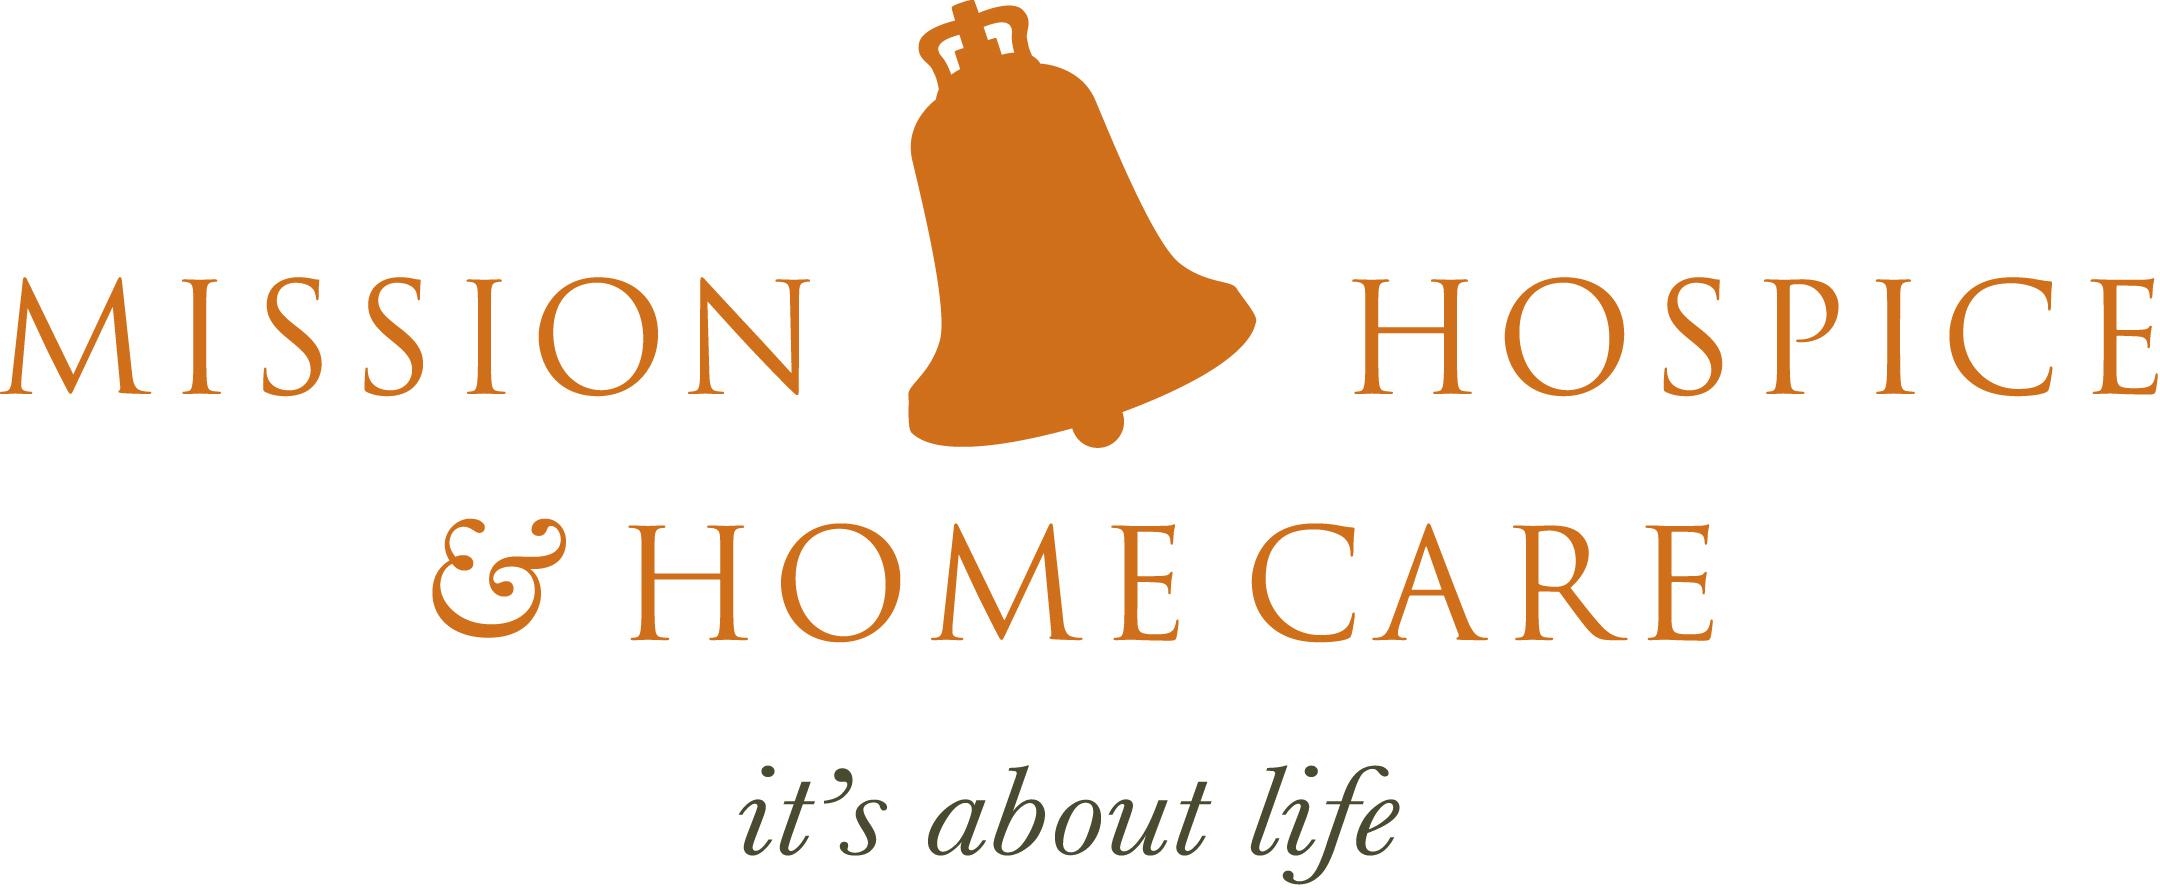 Mission Hospice & Home Care logo